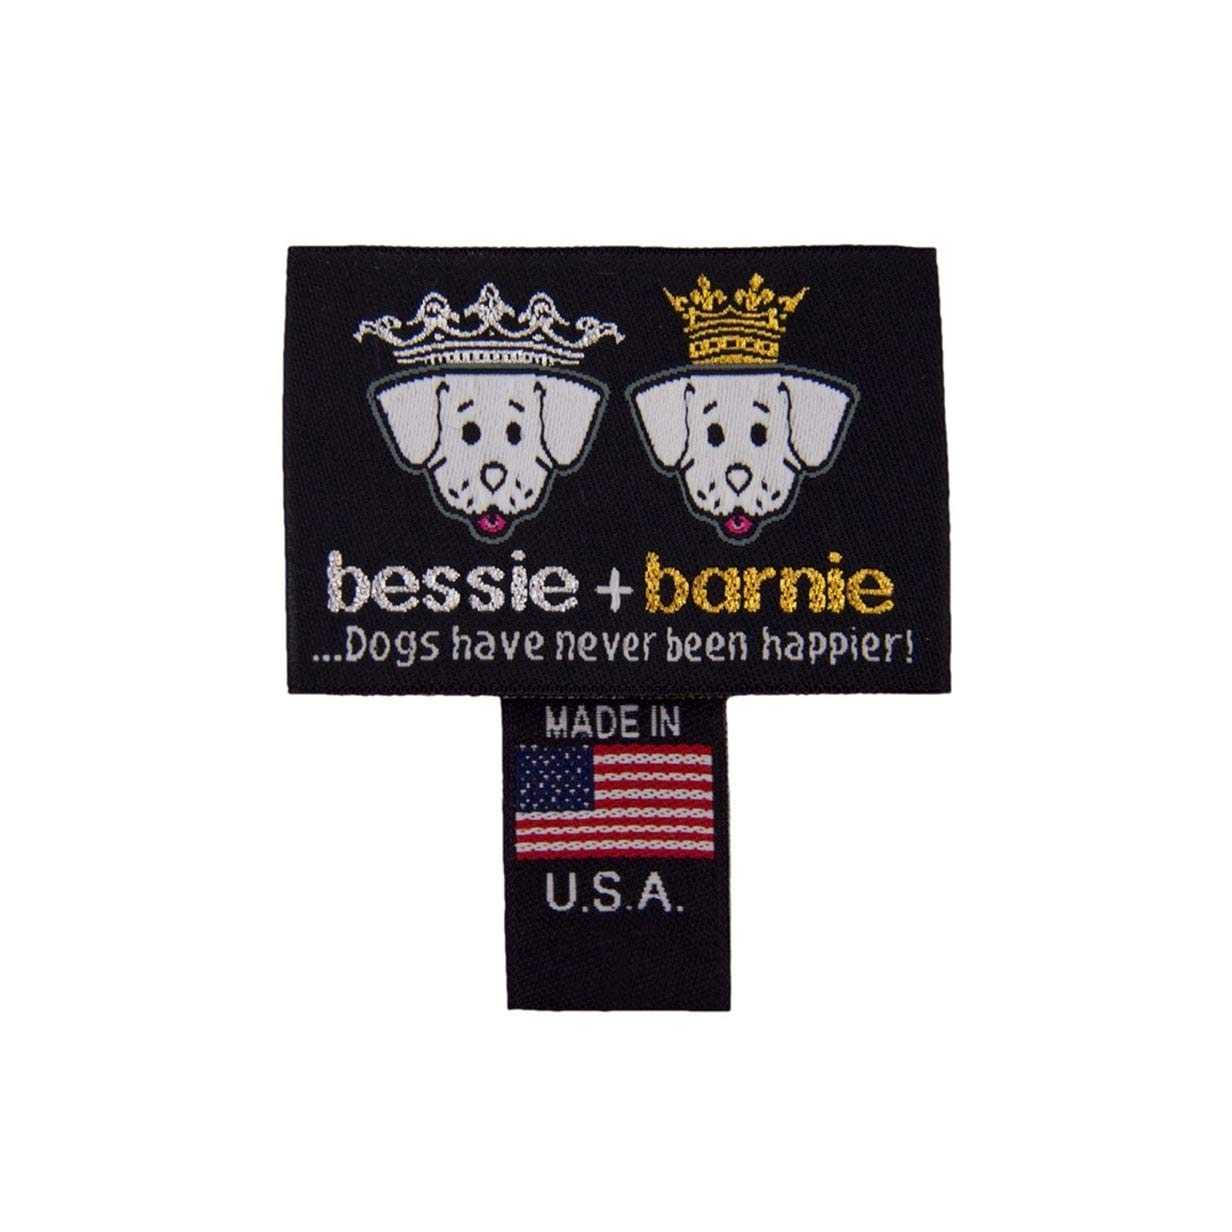 BESSIE AND BARNIE Signature Aspen Snow Leopard Luxury Extra Plush Faux Fur Bagel Pet/Dog Bed (Multiple Sizes)